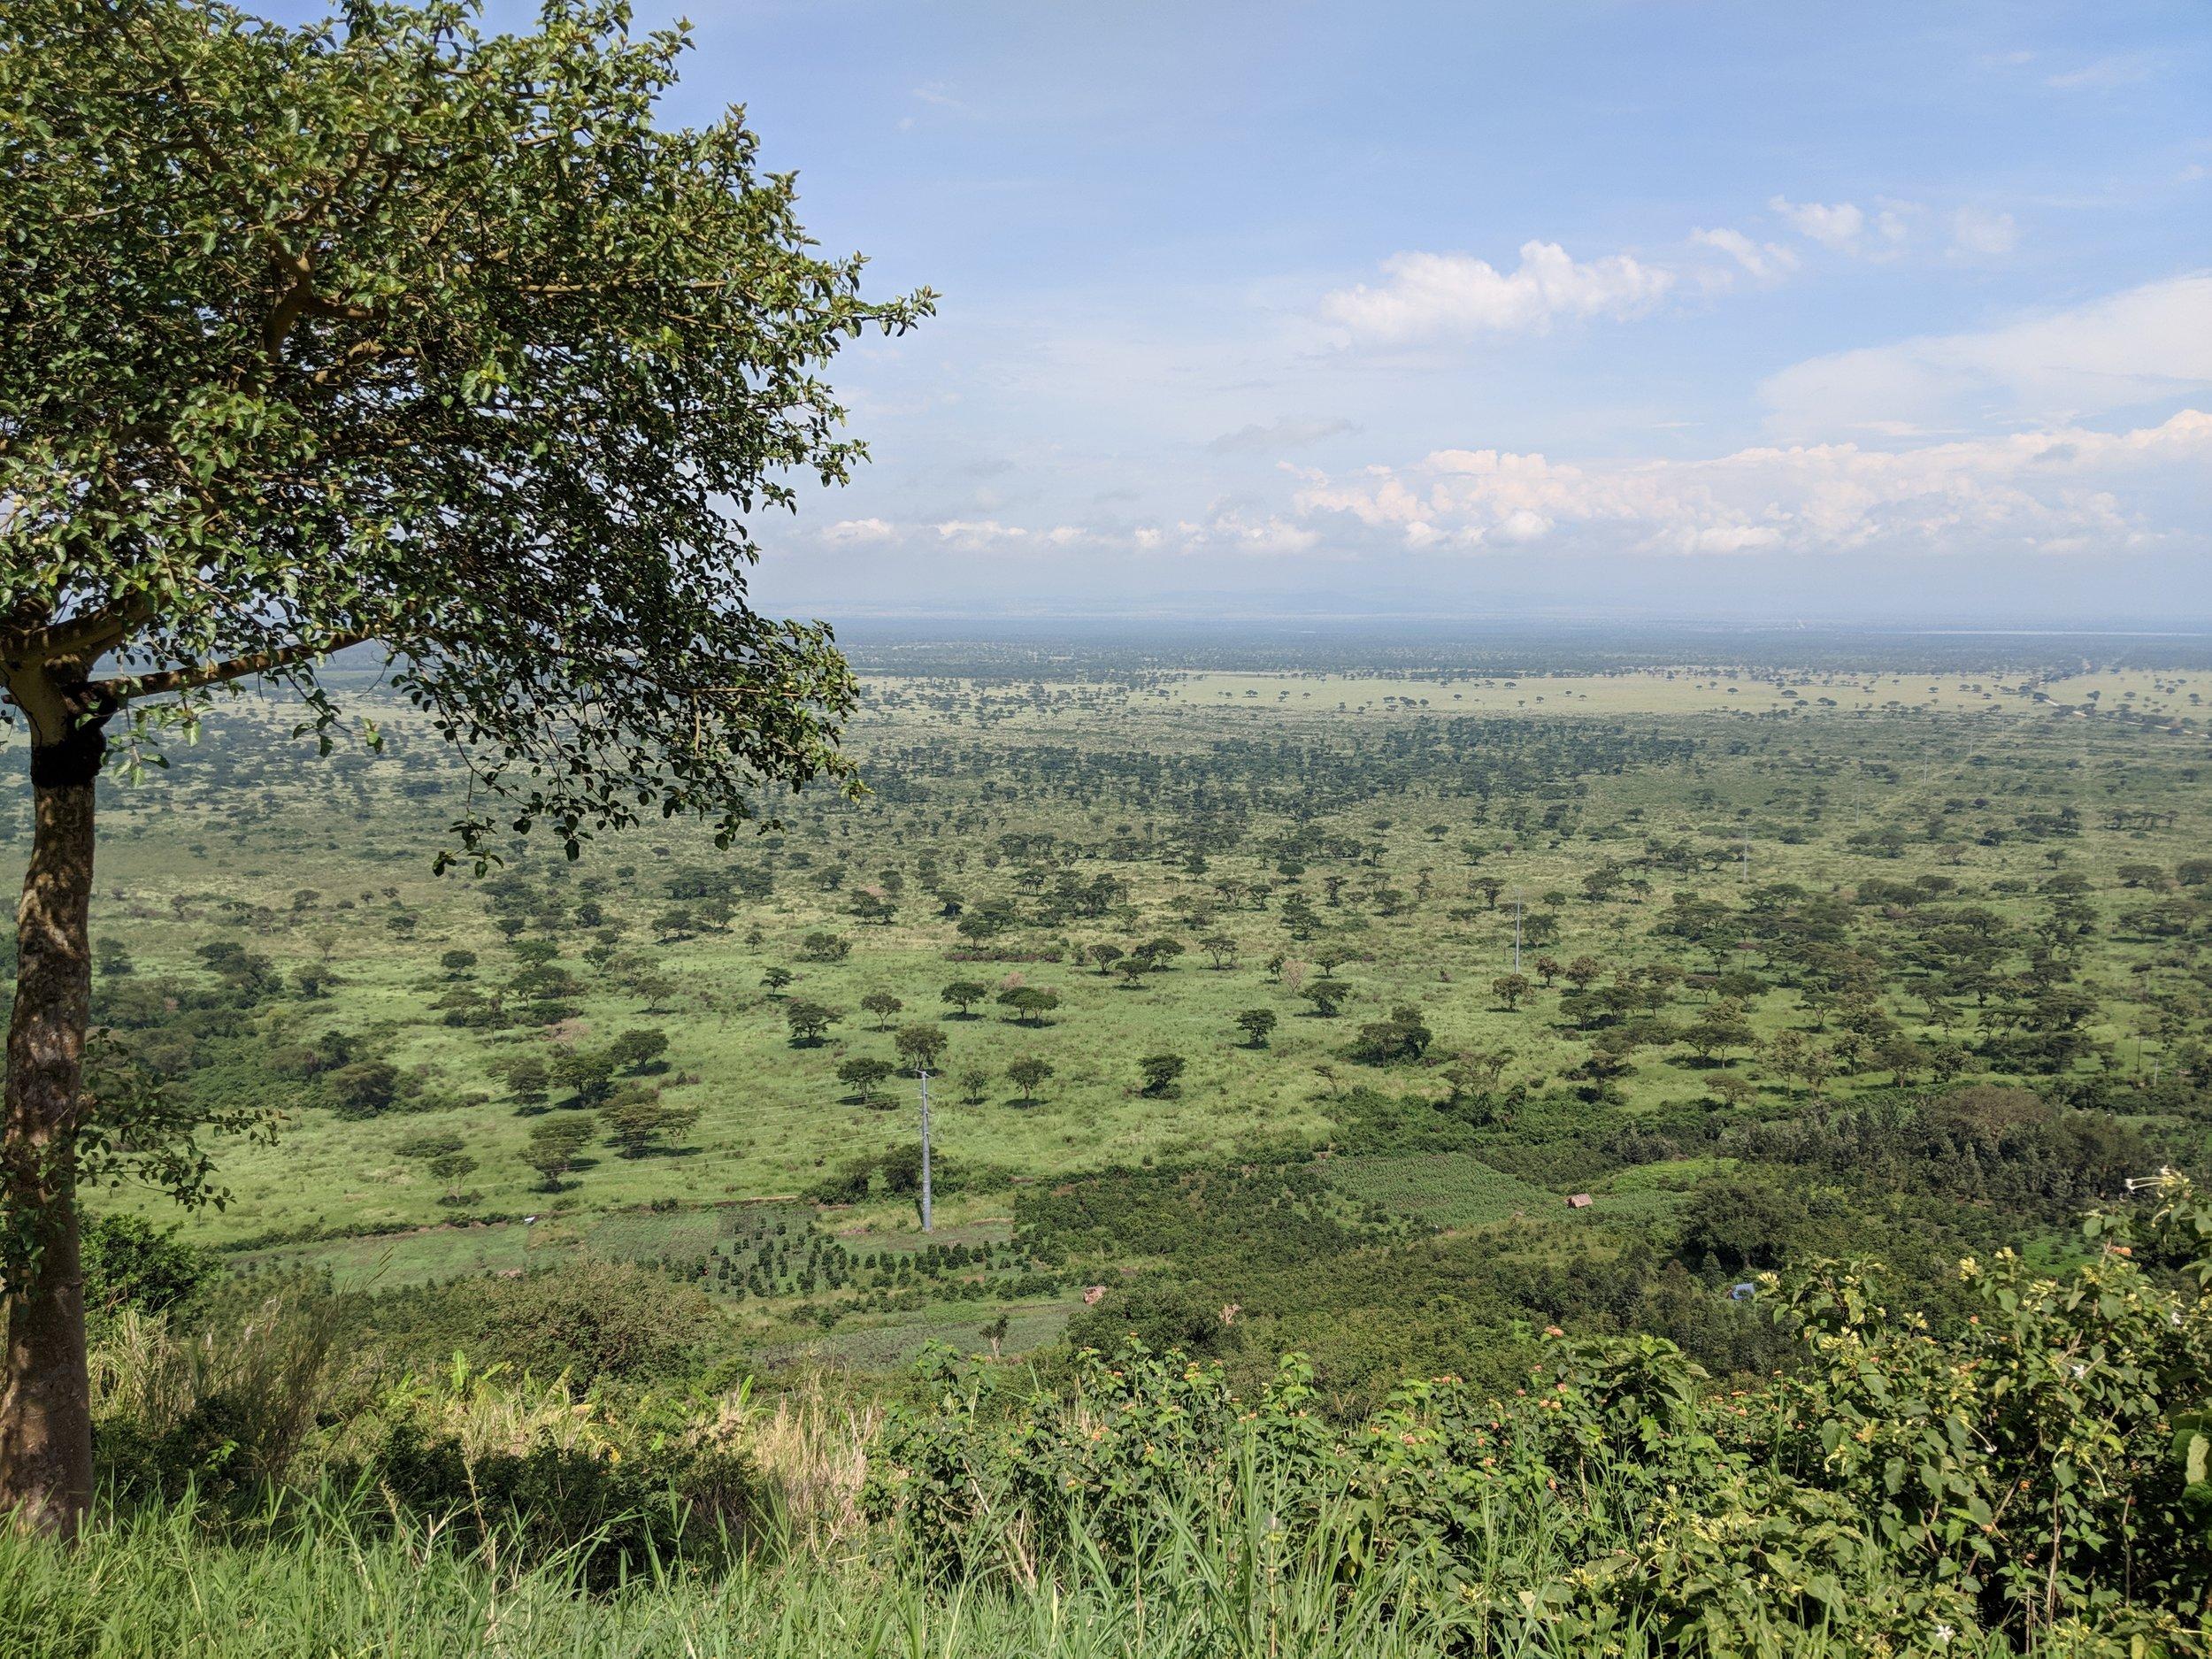 A savanna landscape in Uganda. Photographer: Erman Misirlisoy